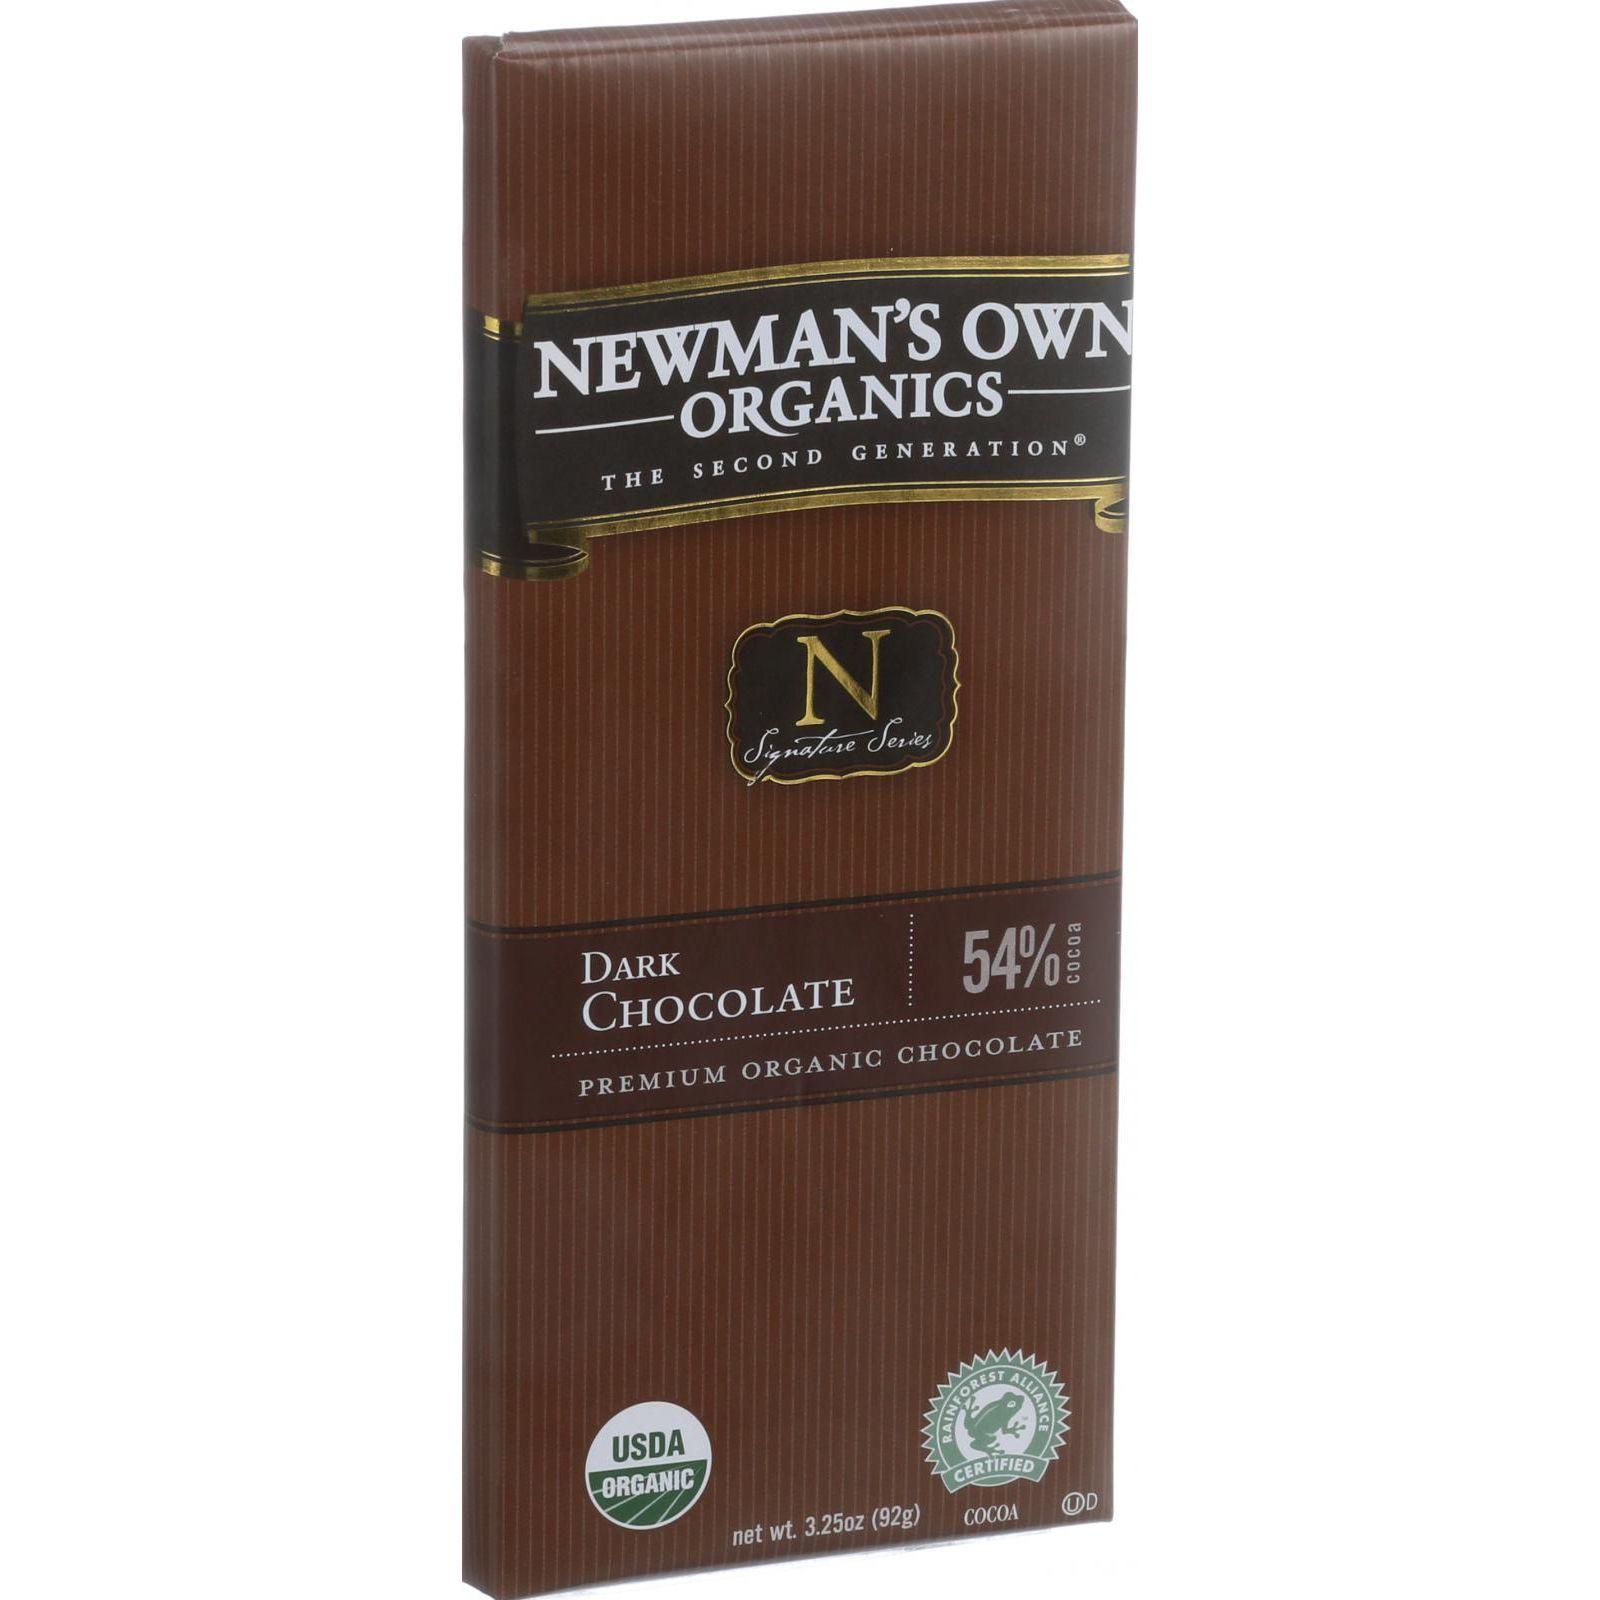 Newman's Own Organics Chocolate Bar - Organic - Dark Chocolate - 3.25 oz Bars - Case of 12